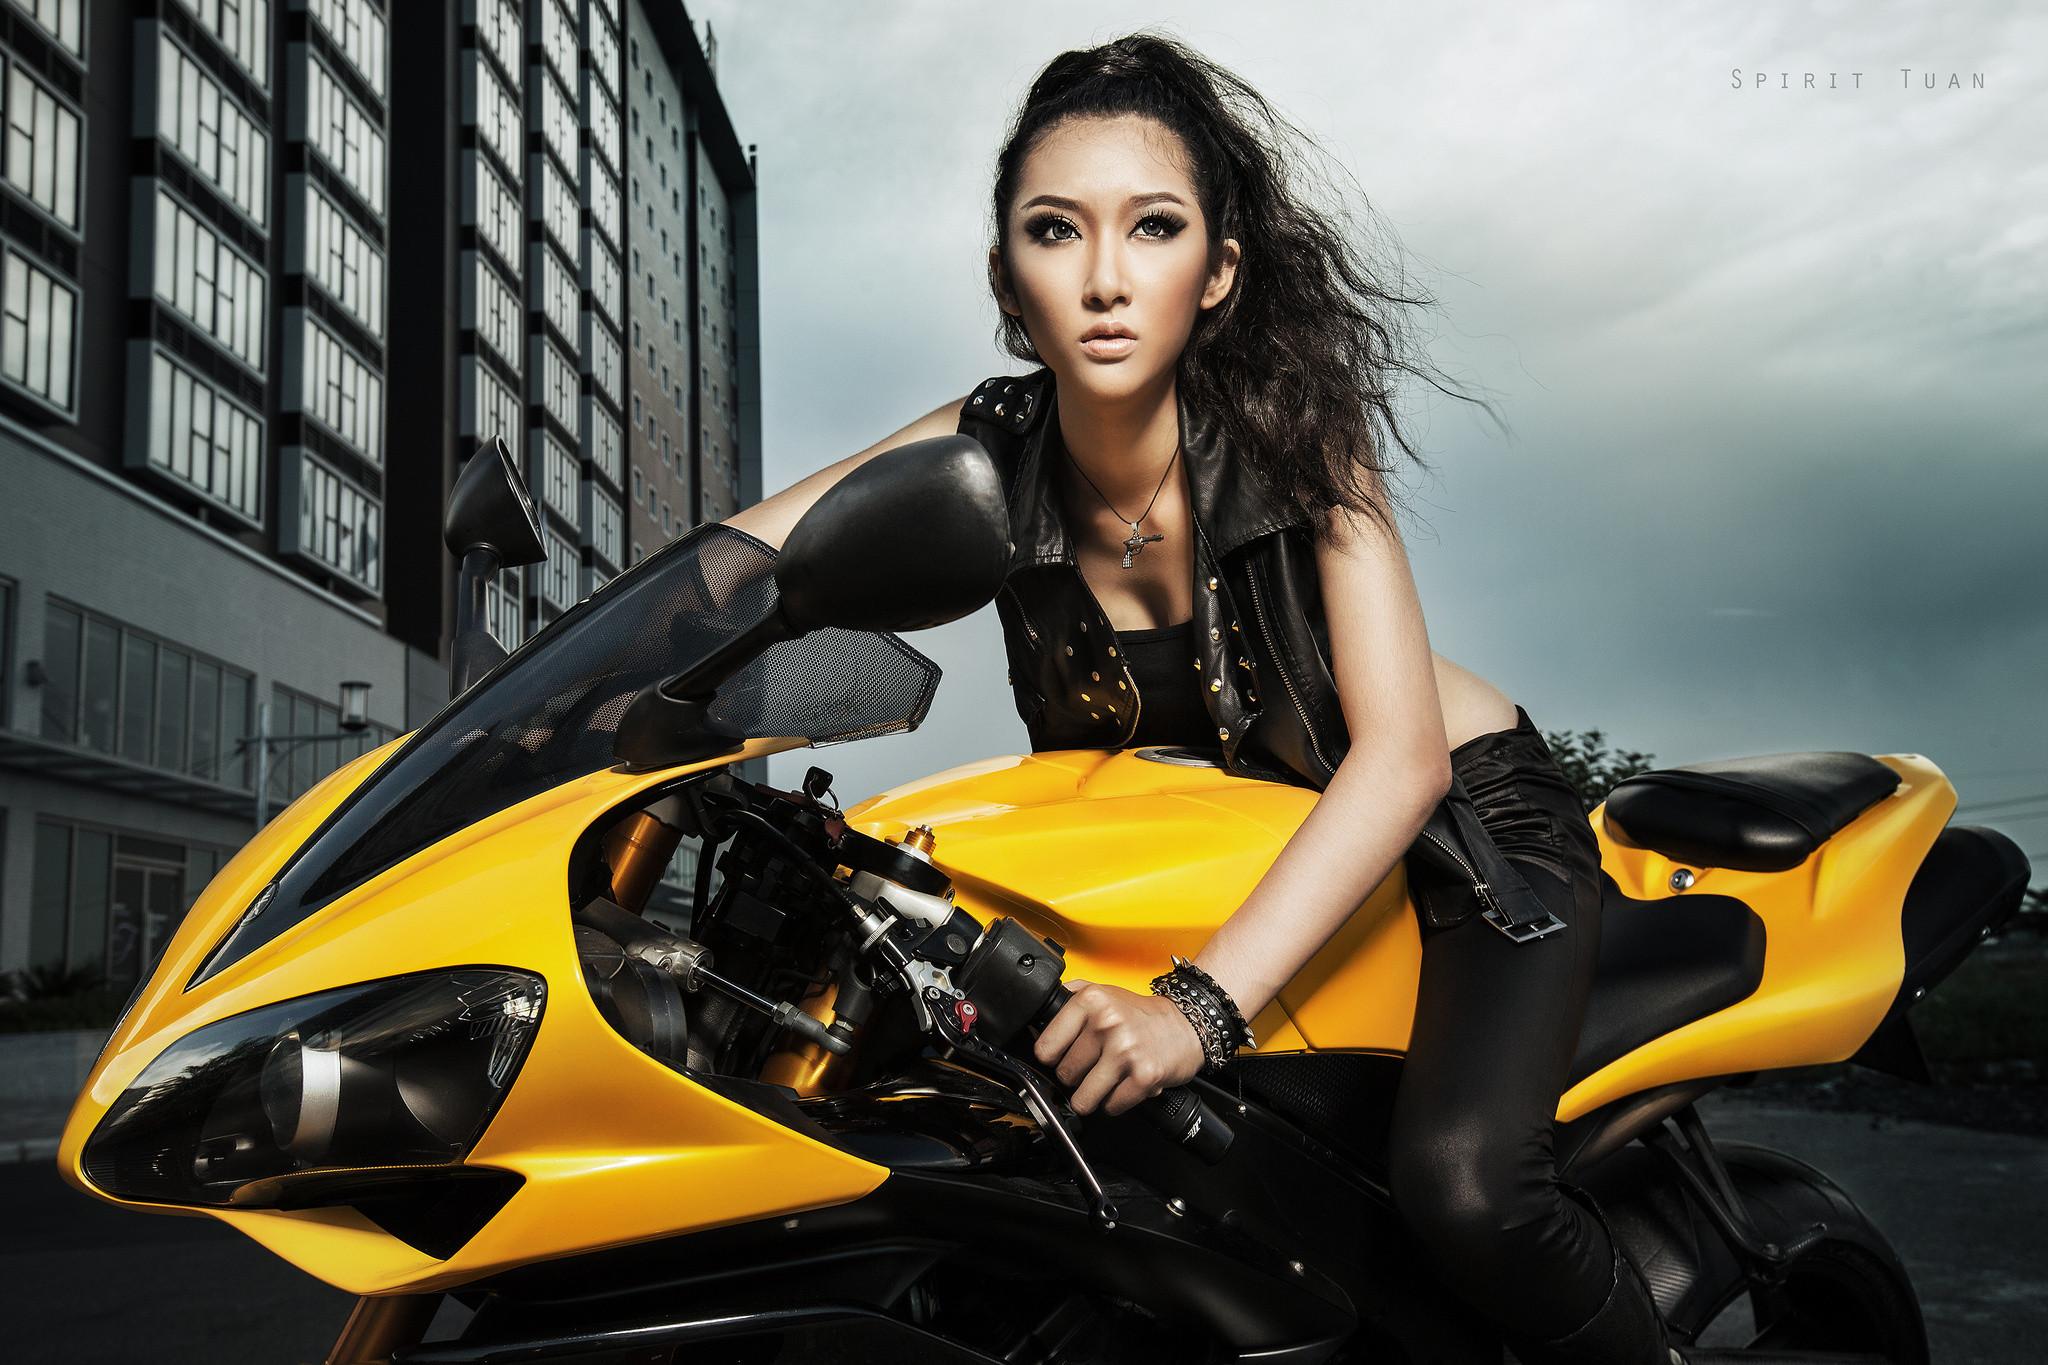 asian Motorcycle Babes | Kelly Khoa Nguyen asian bike motorcycles asian girl  girls wallpaper .